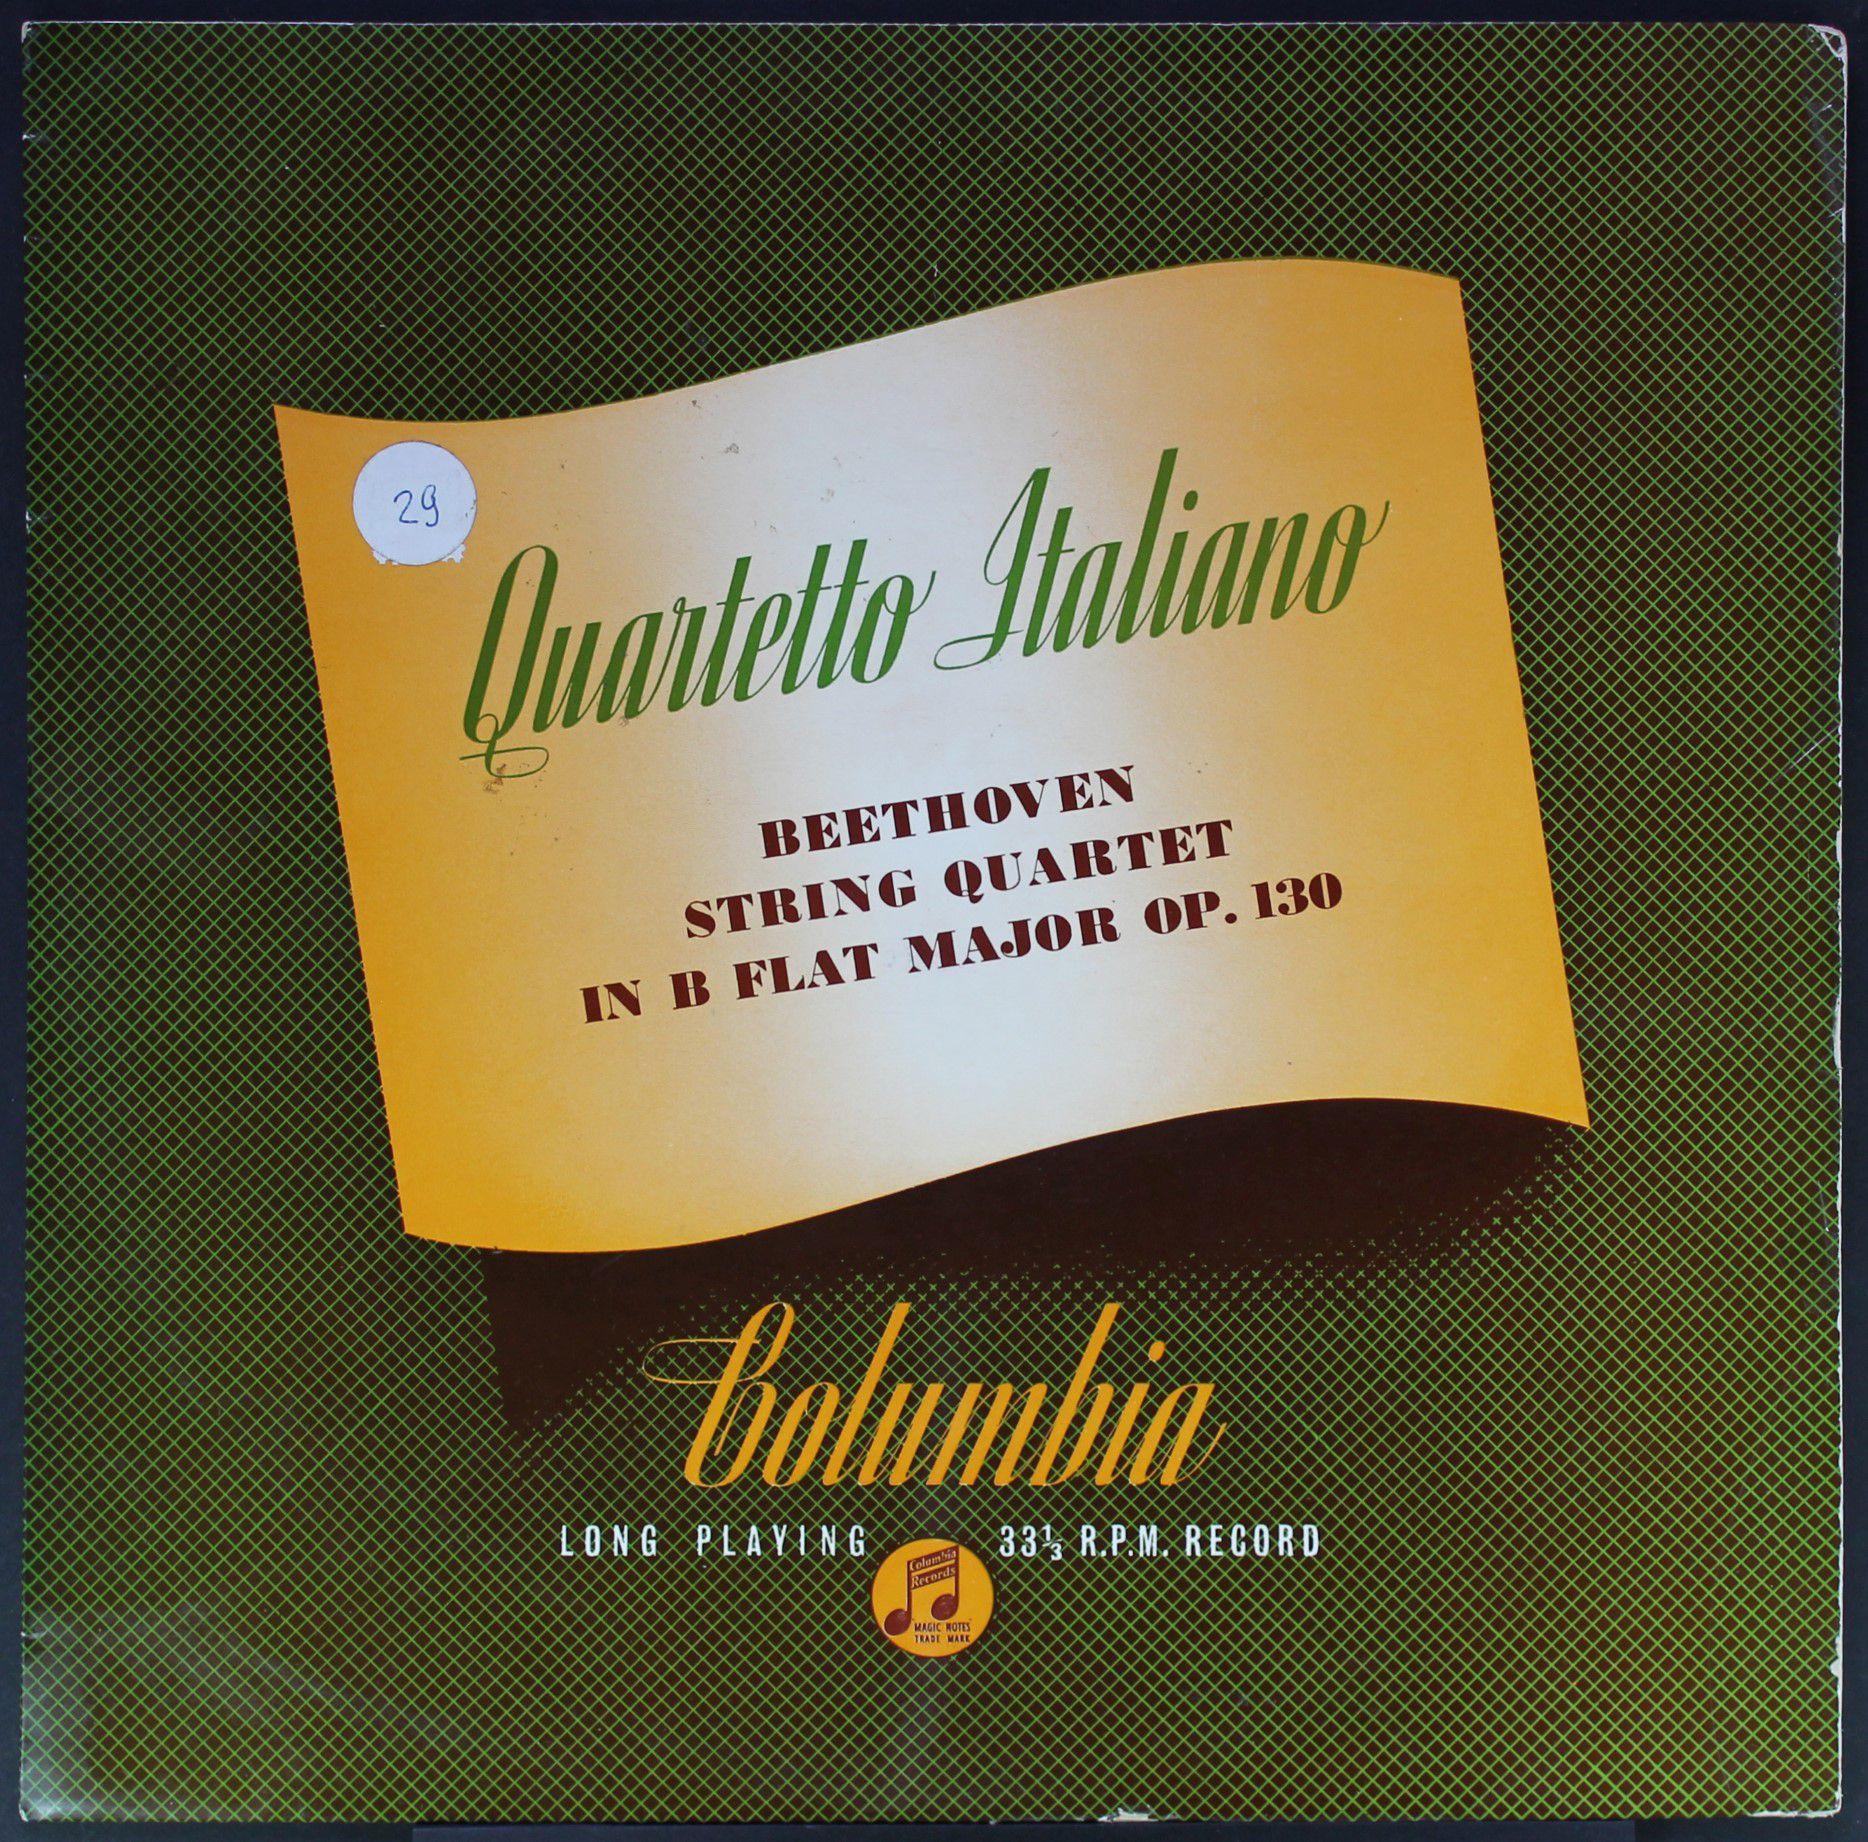 Quartetto Italiano | Beethoven - String Quartet In B Flat Major, Op. 130 - 33T